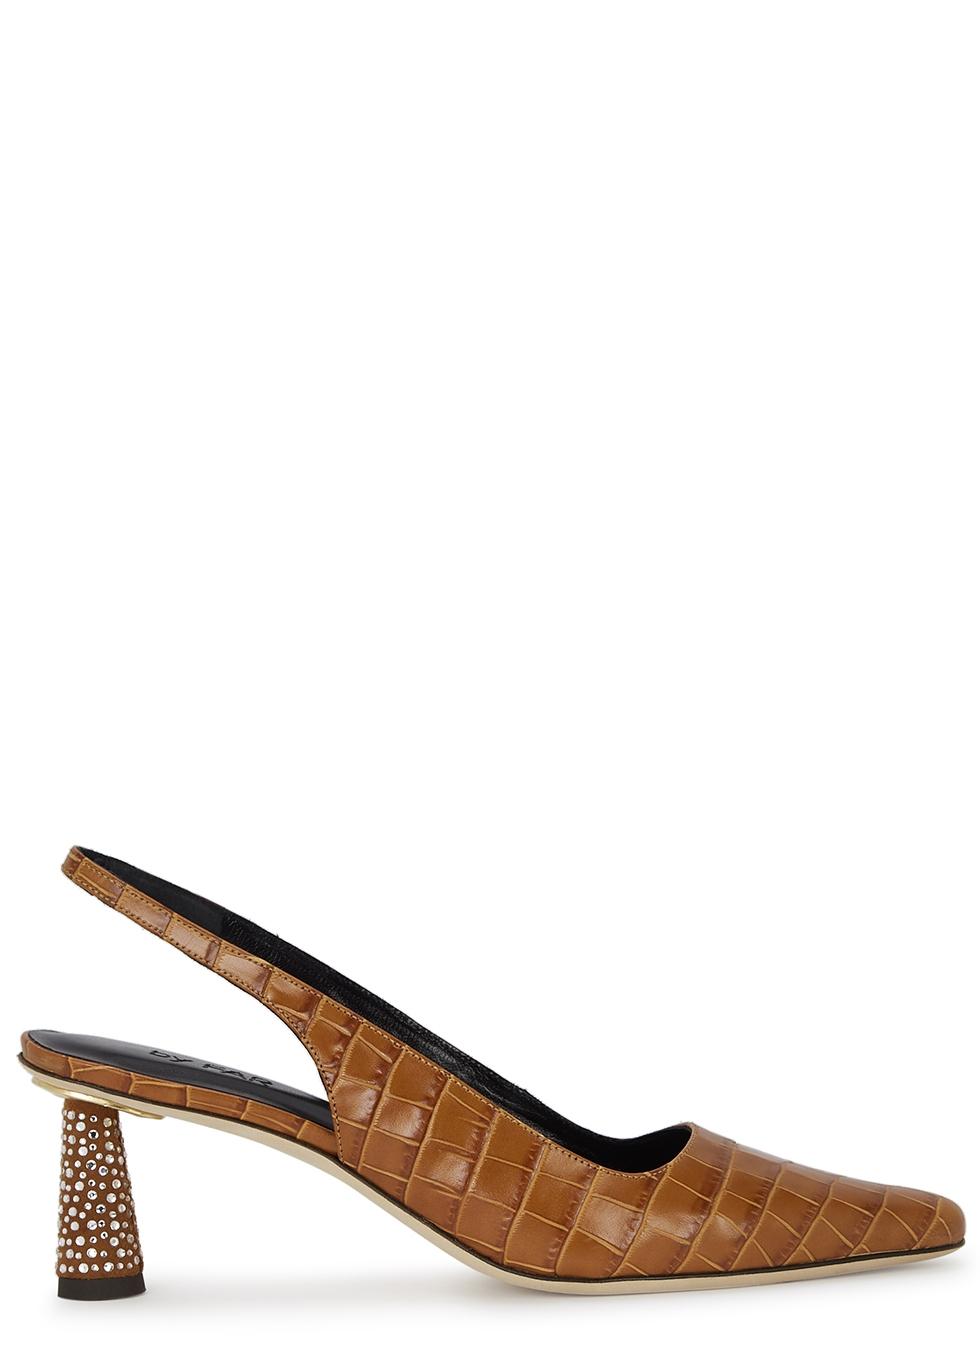 Diana 60 crocodile-effect slingback leather pumps